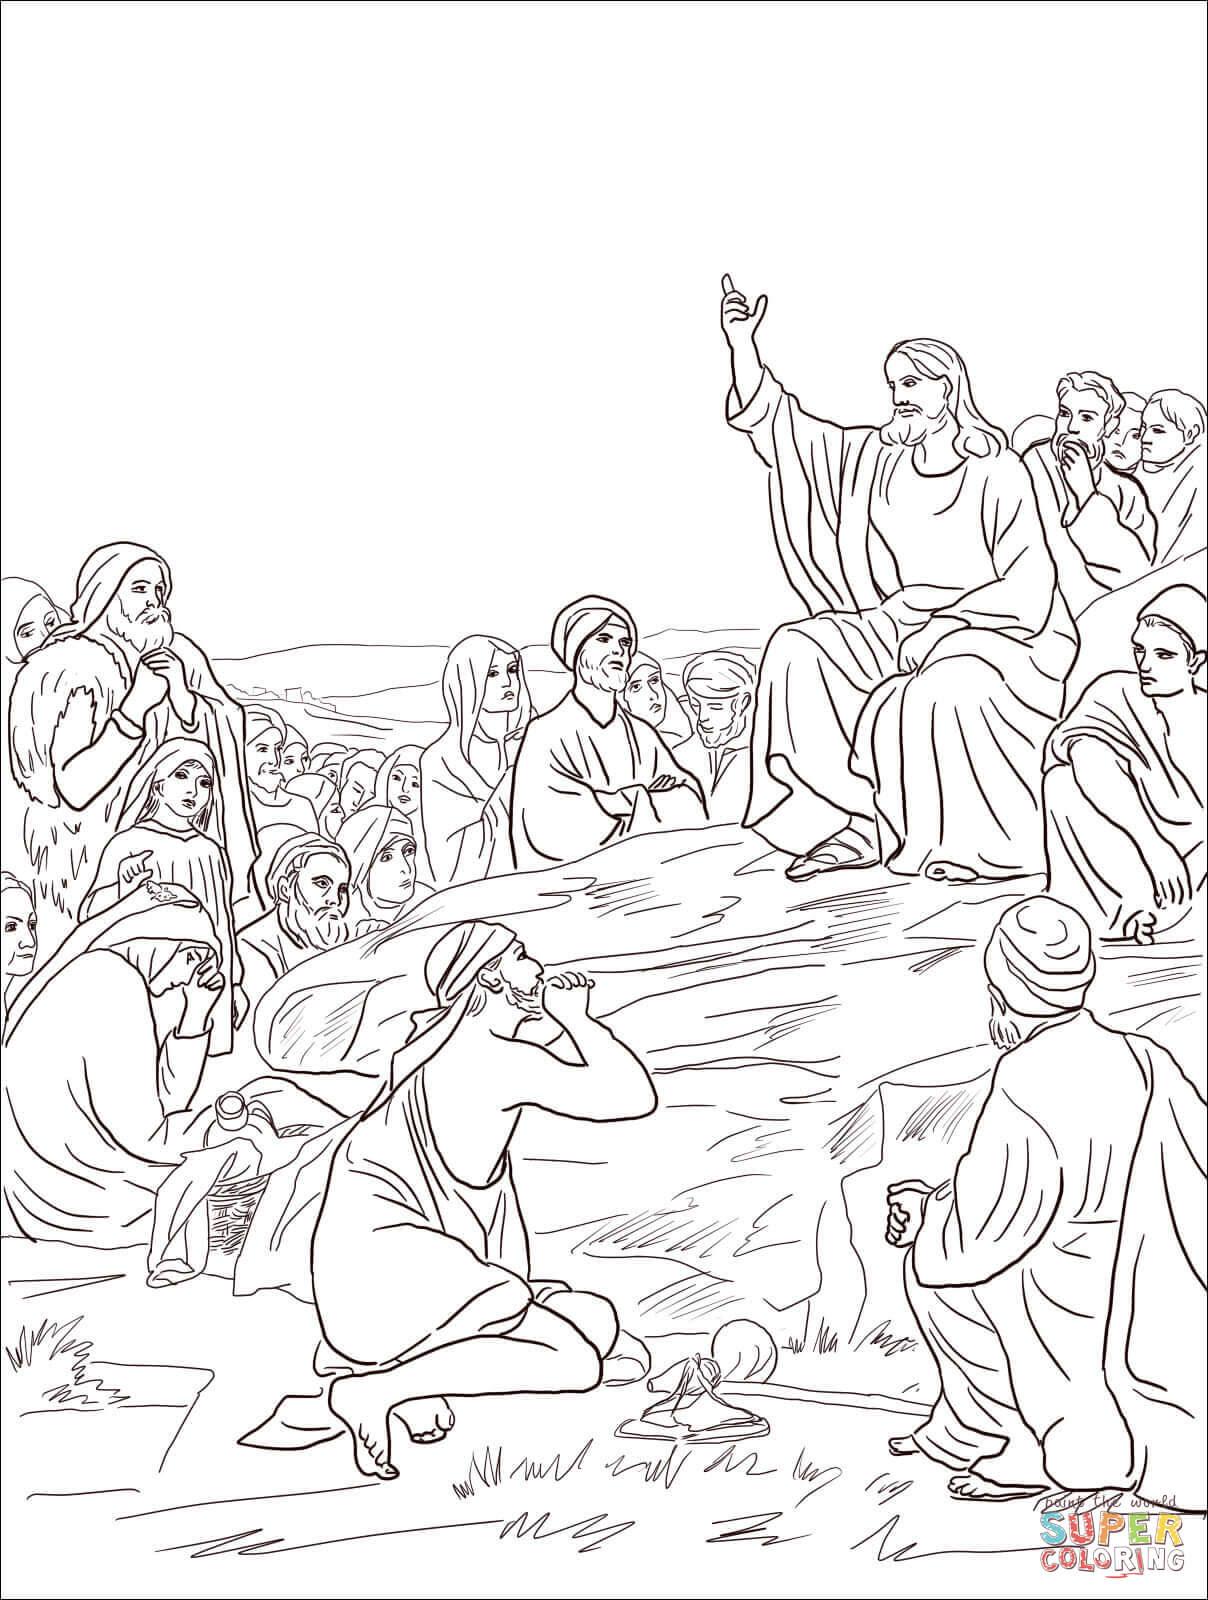 Jesus Sermon on the Mount coloring page | Free Printable ...